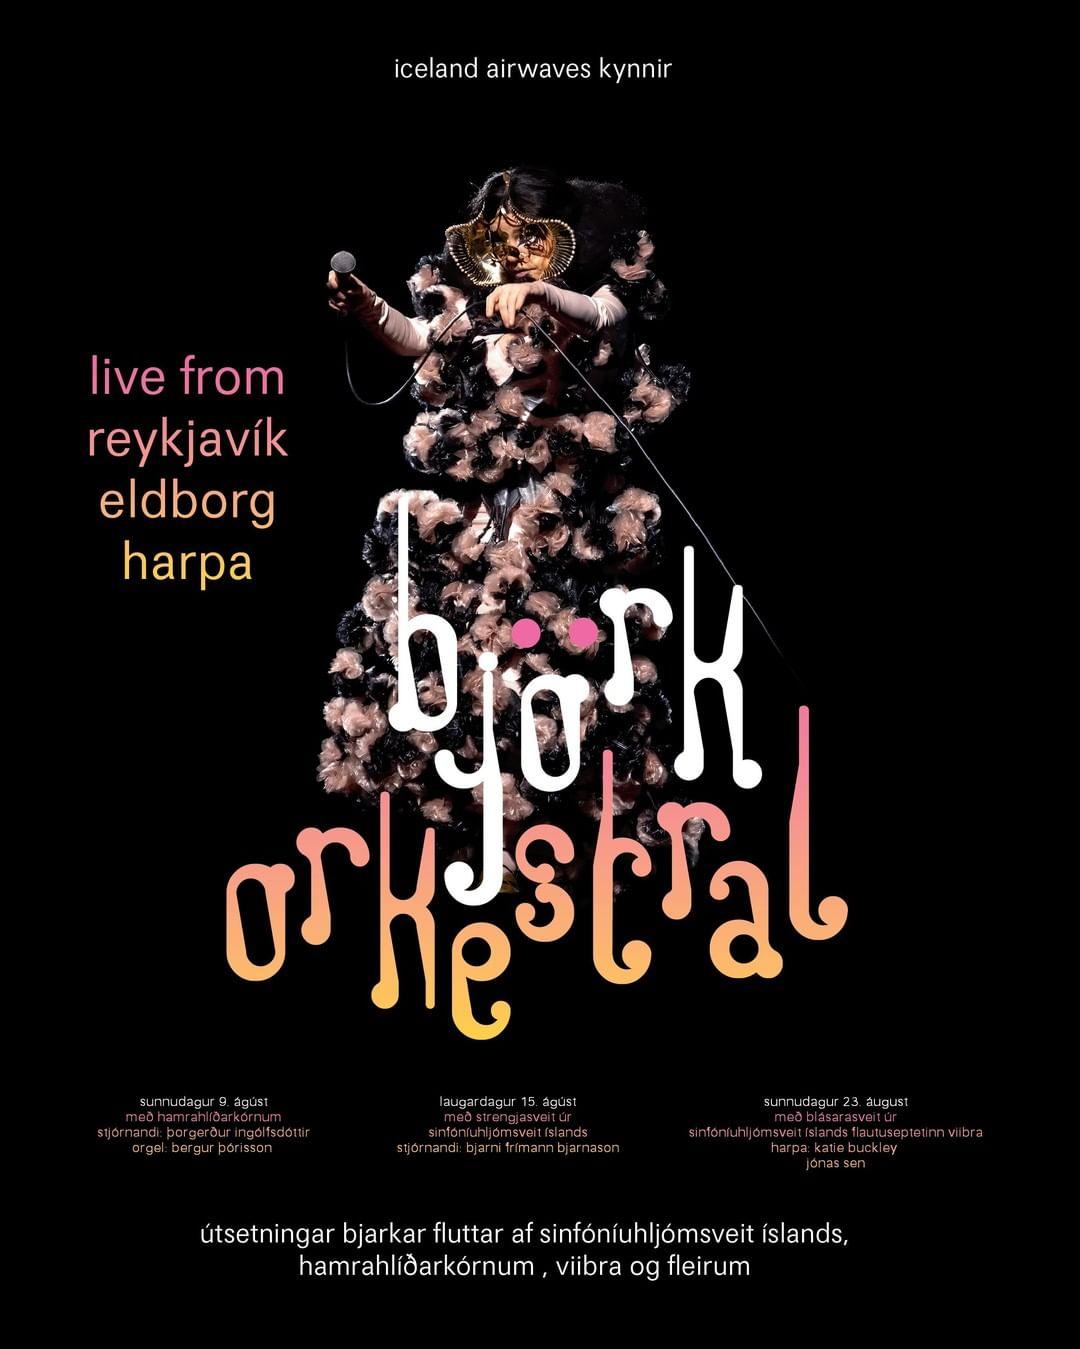 Boletos para Björk Orkestral vía streaming.